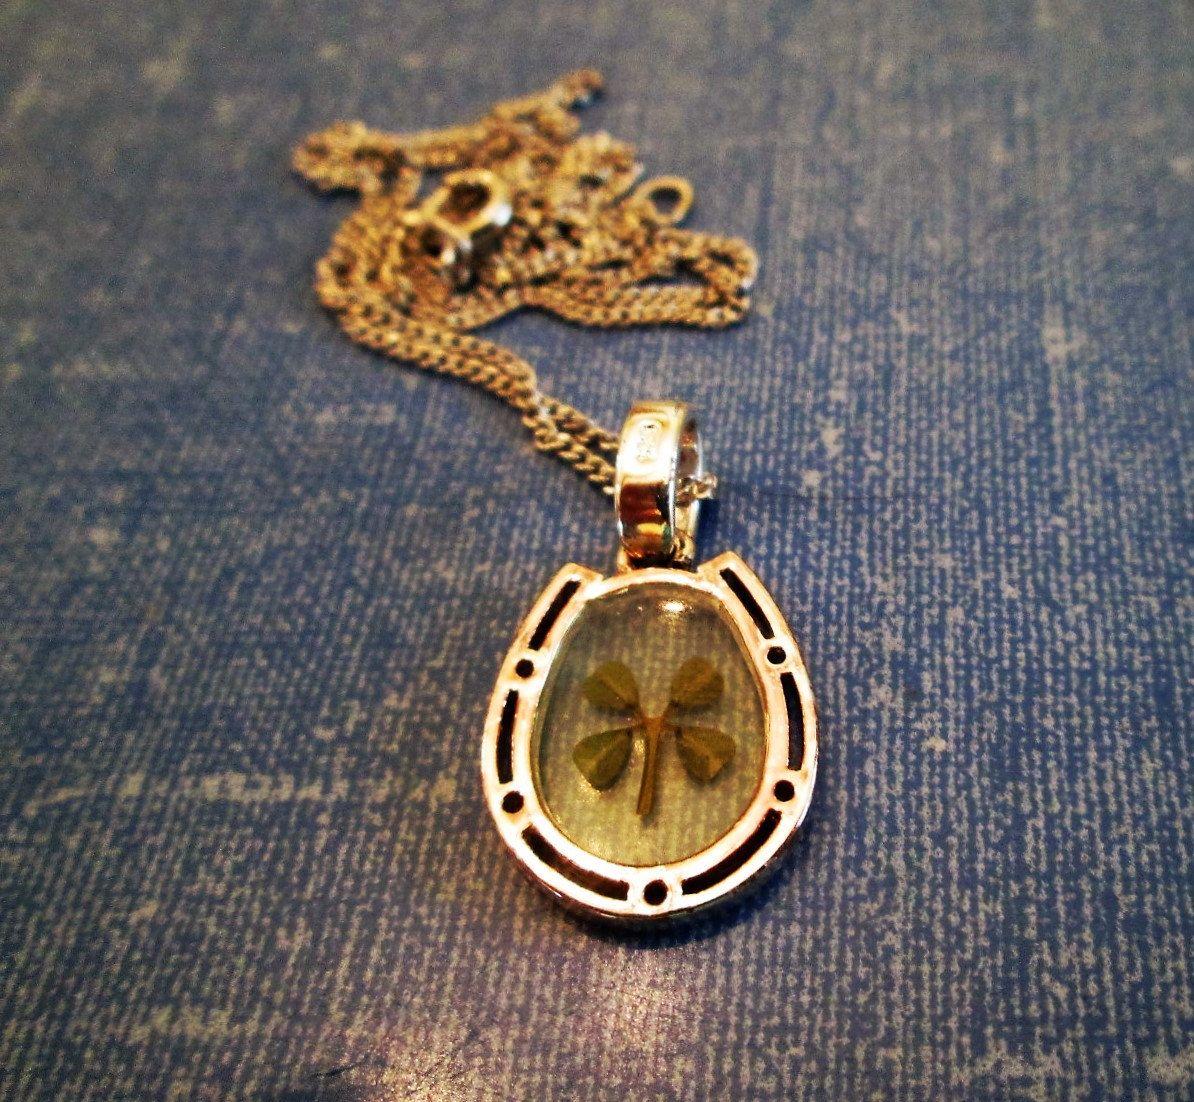 NECKLACE  - Vintage - Good  Luck - Real 4 Leaf CLOVER - HORSESHOE - Lucite -  Estate Sale - 16 inch sterling -   necklace226 by MOONCHILD111 on Etsy